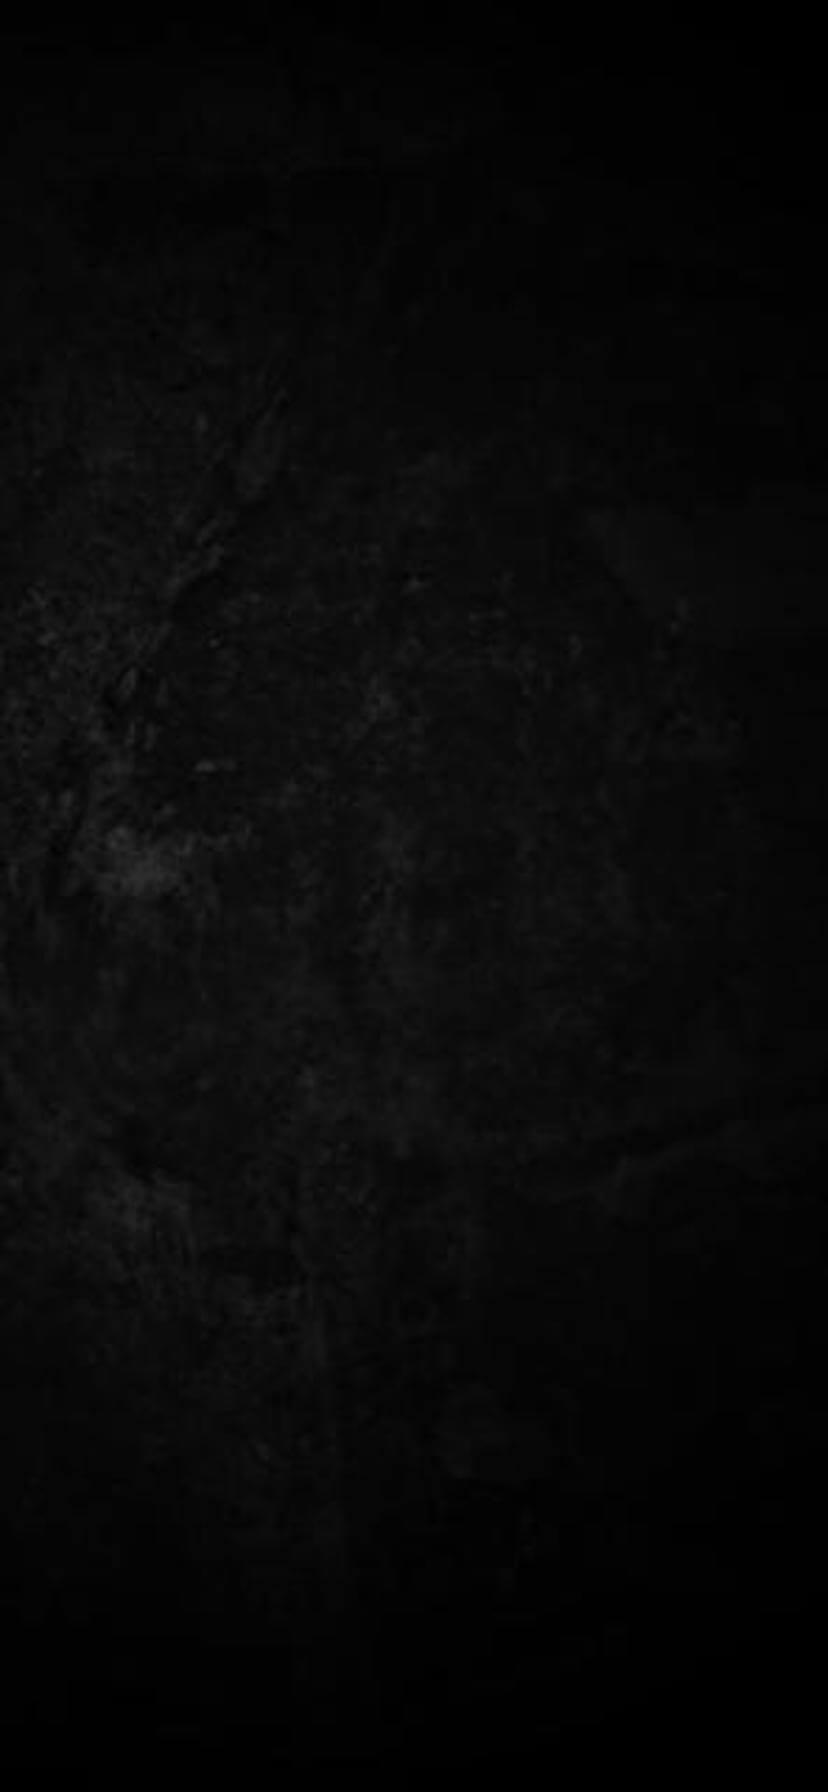 Iphone Xs Black Wallpapers Wallpaper Cave